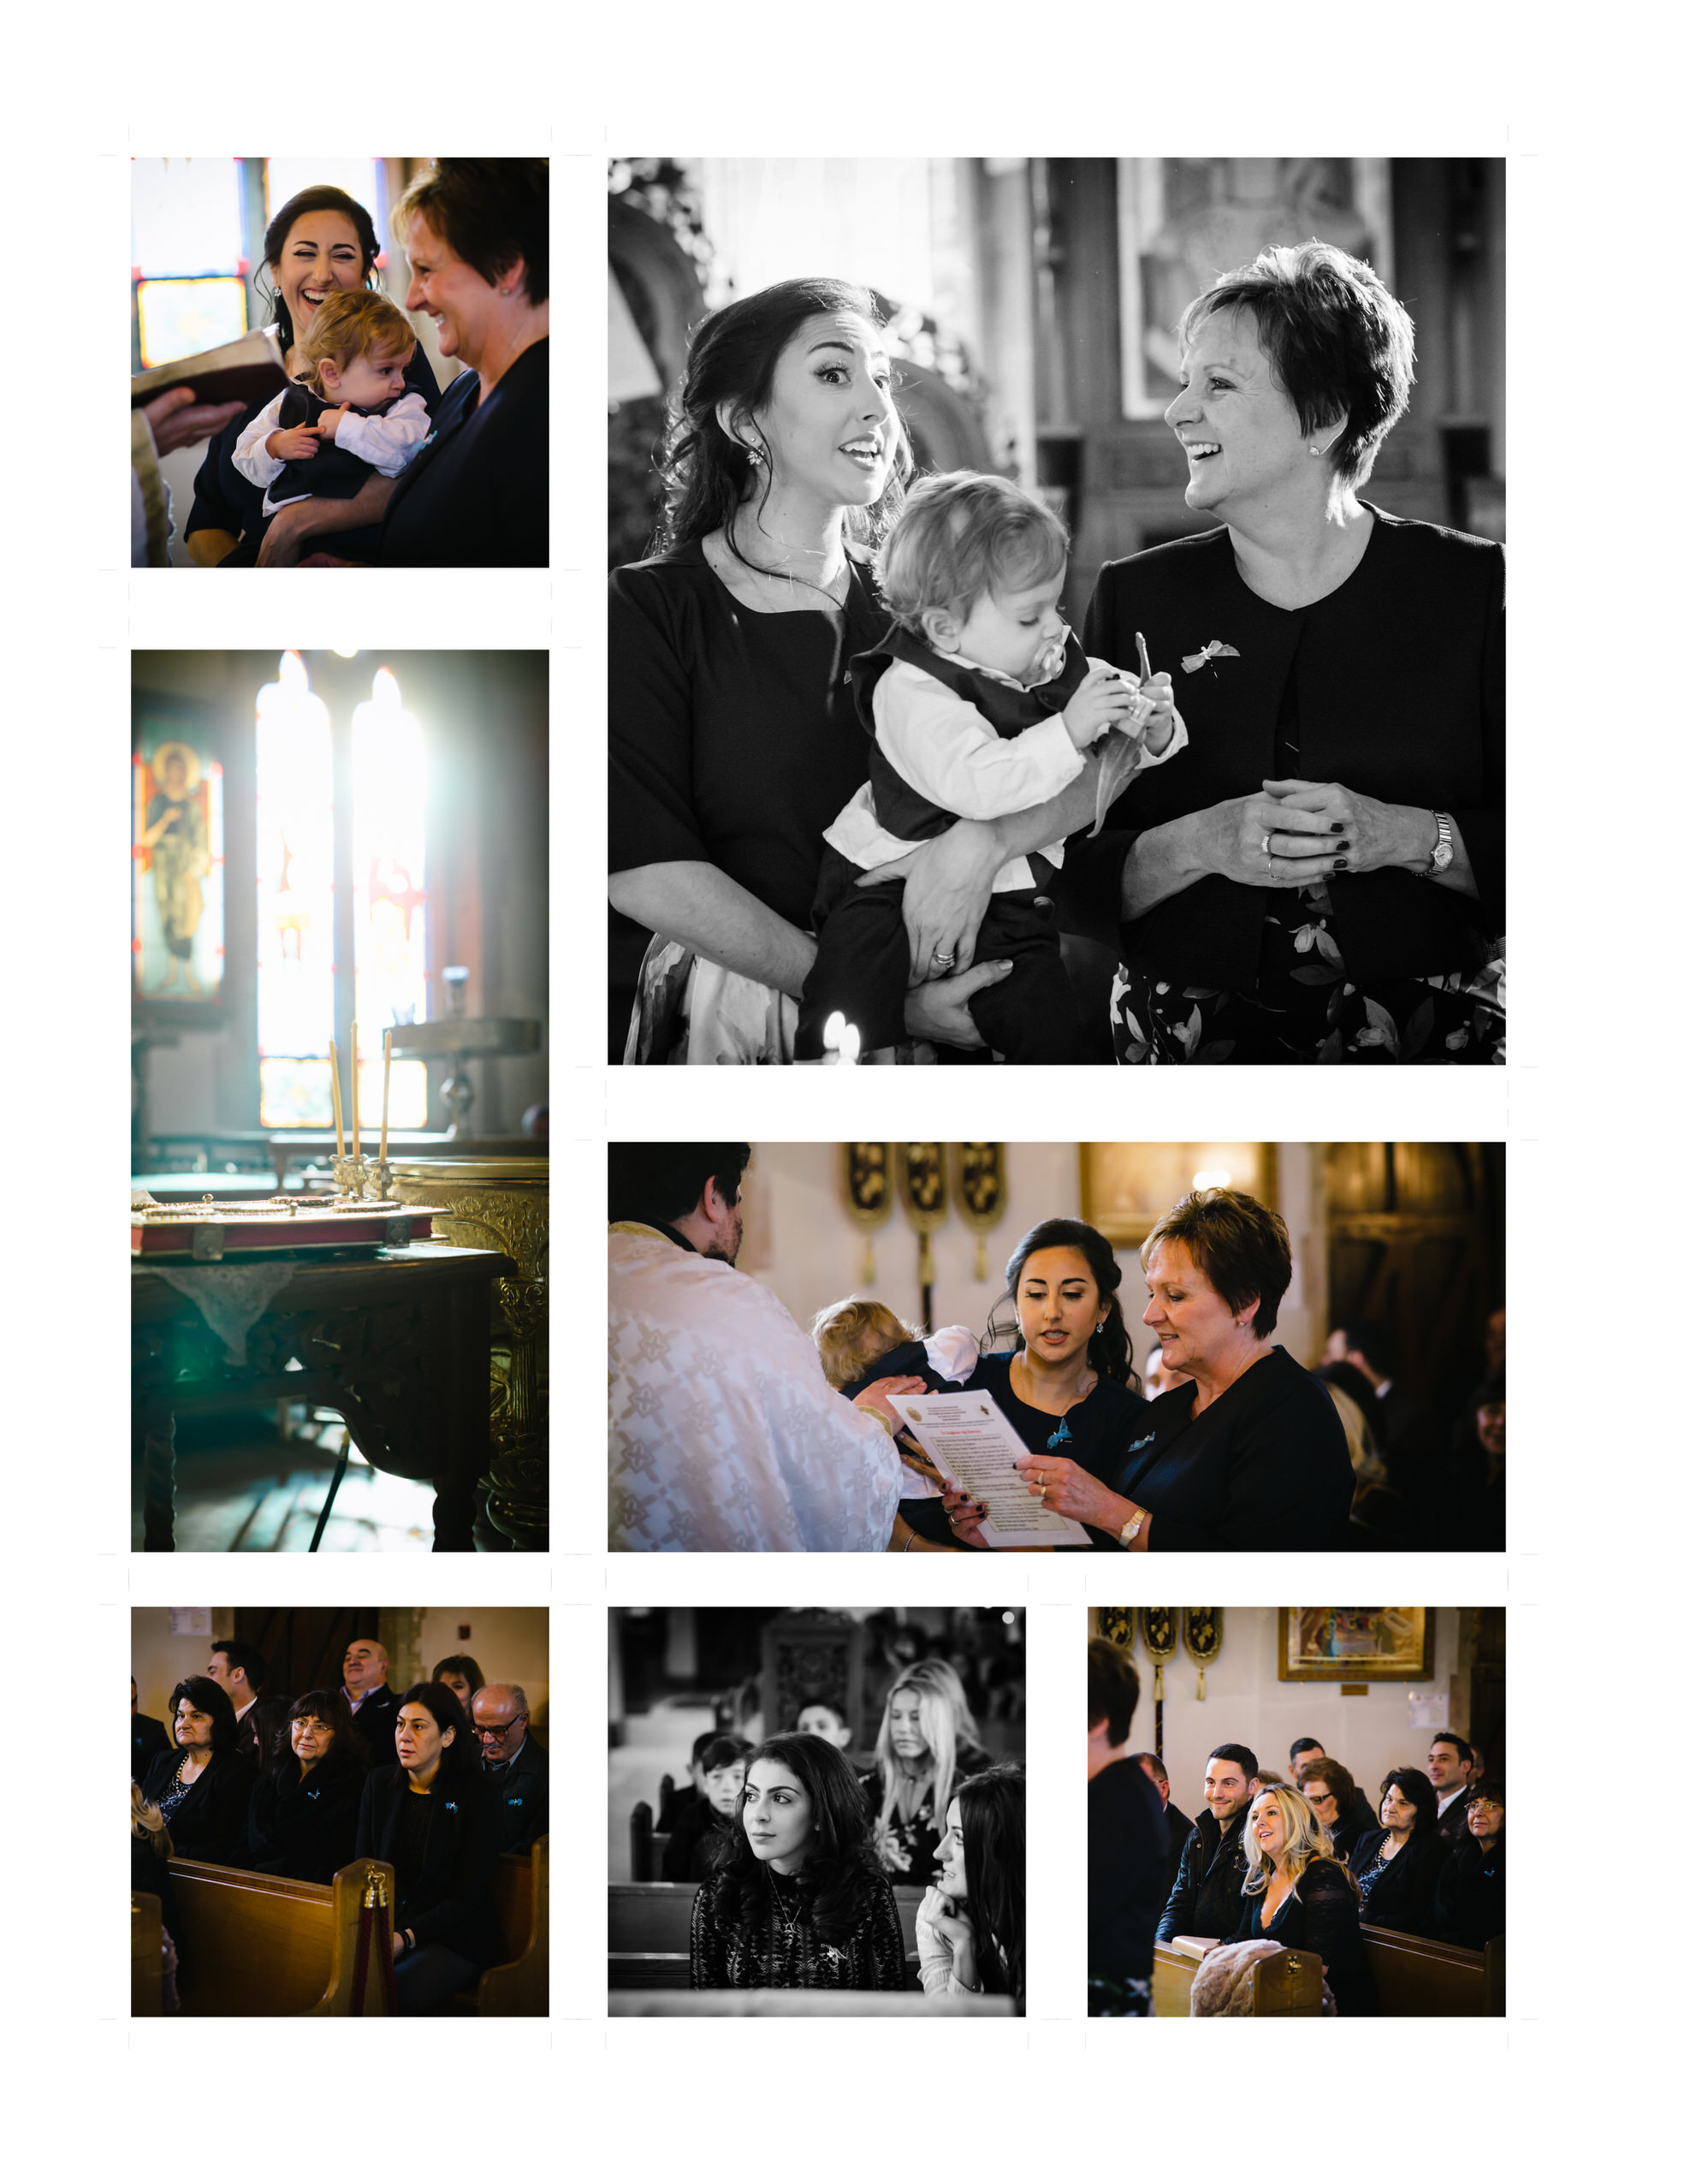 greek christening photographer herts